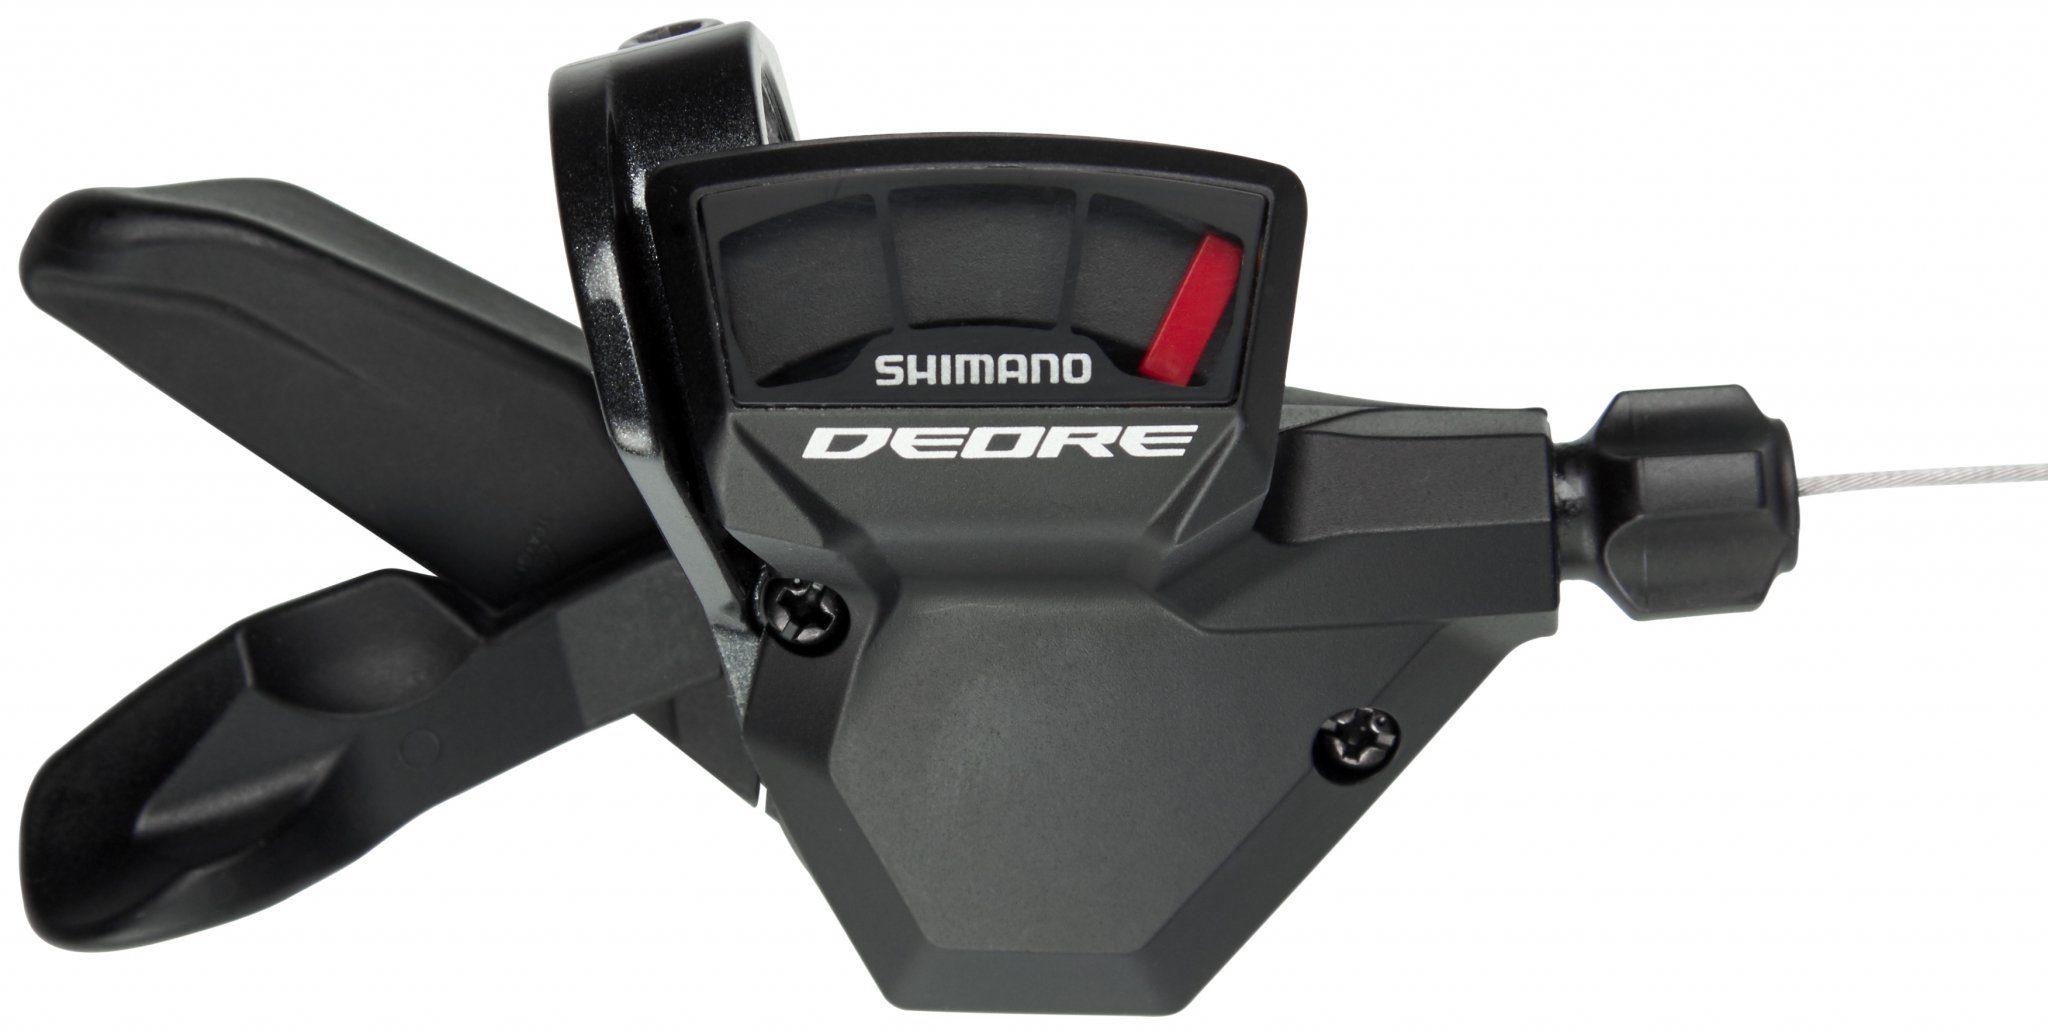 Shimano Schaltung »Deore SL-M590 Schalthebel 9-fach«